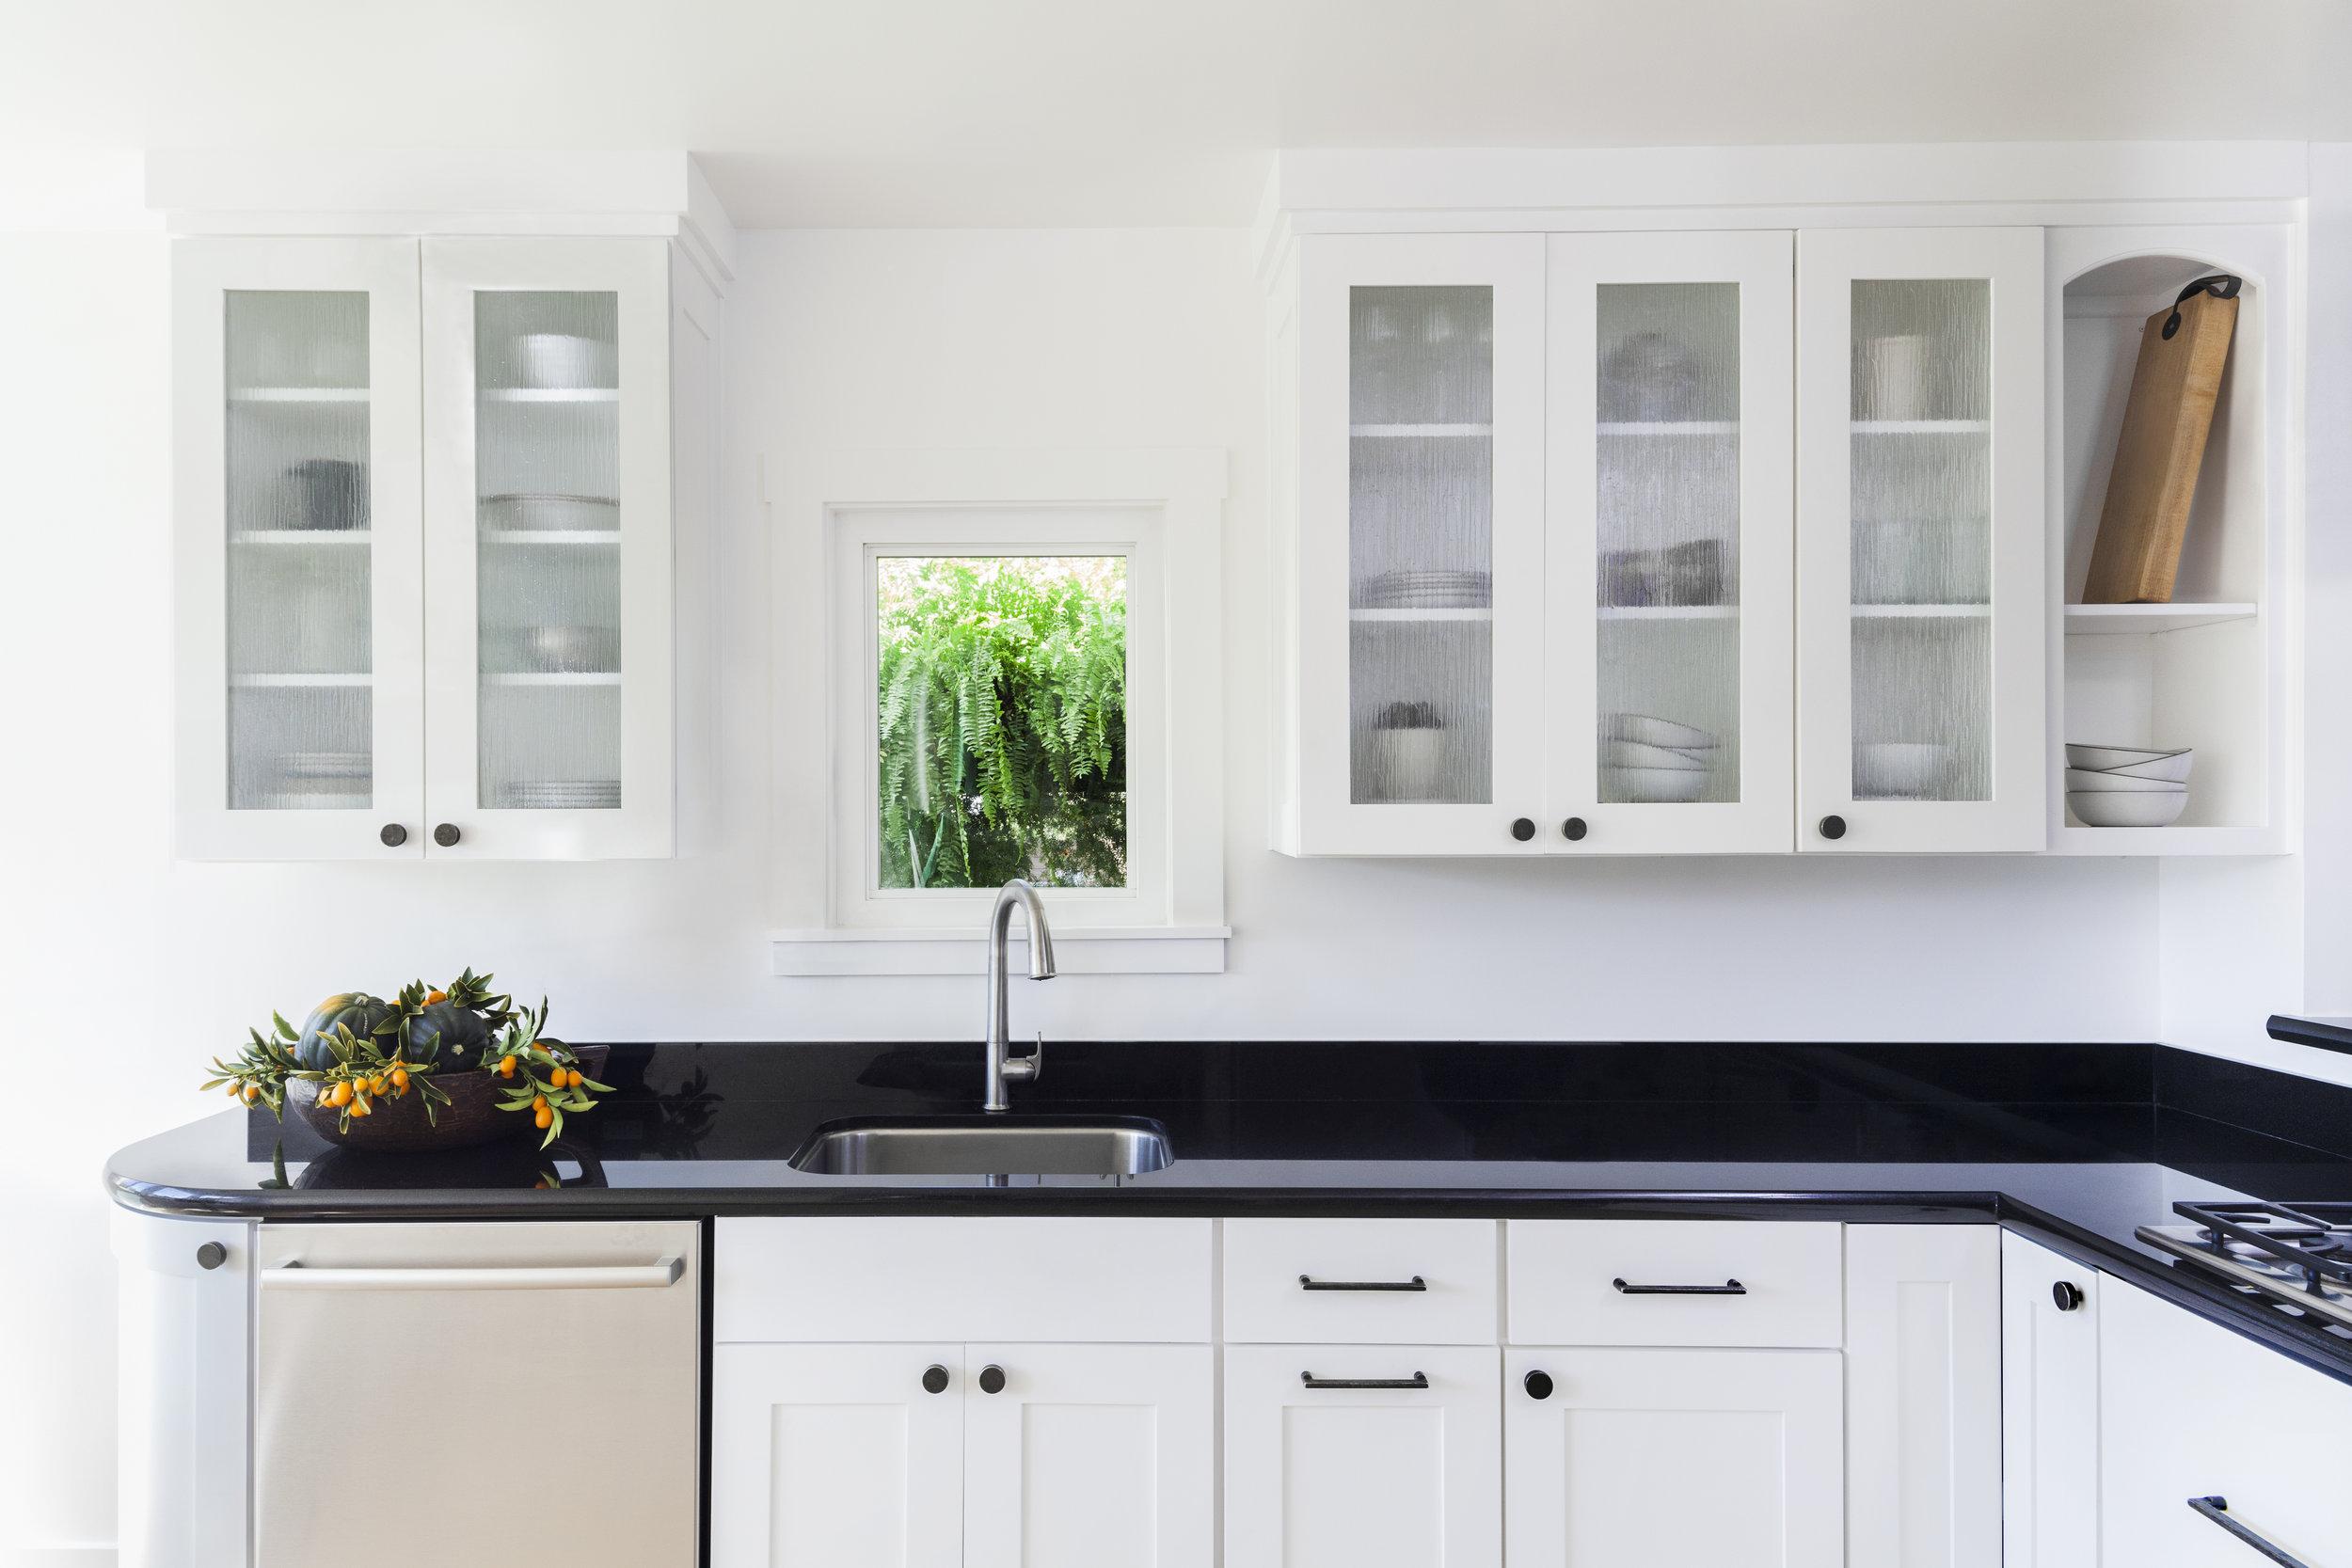 seaside-bungalow-kitchen.jpg